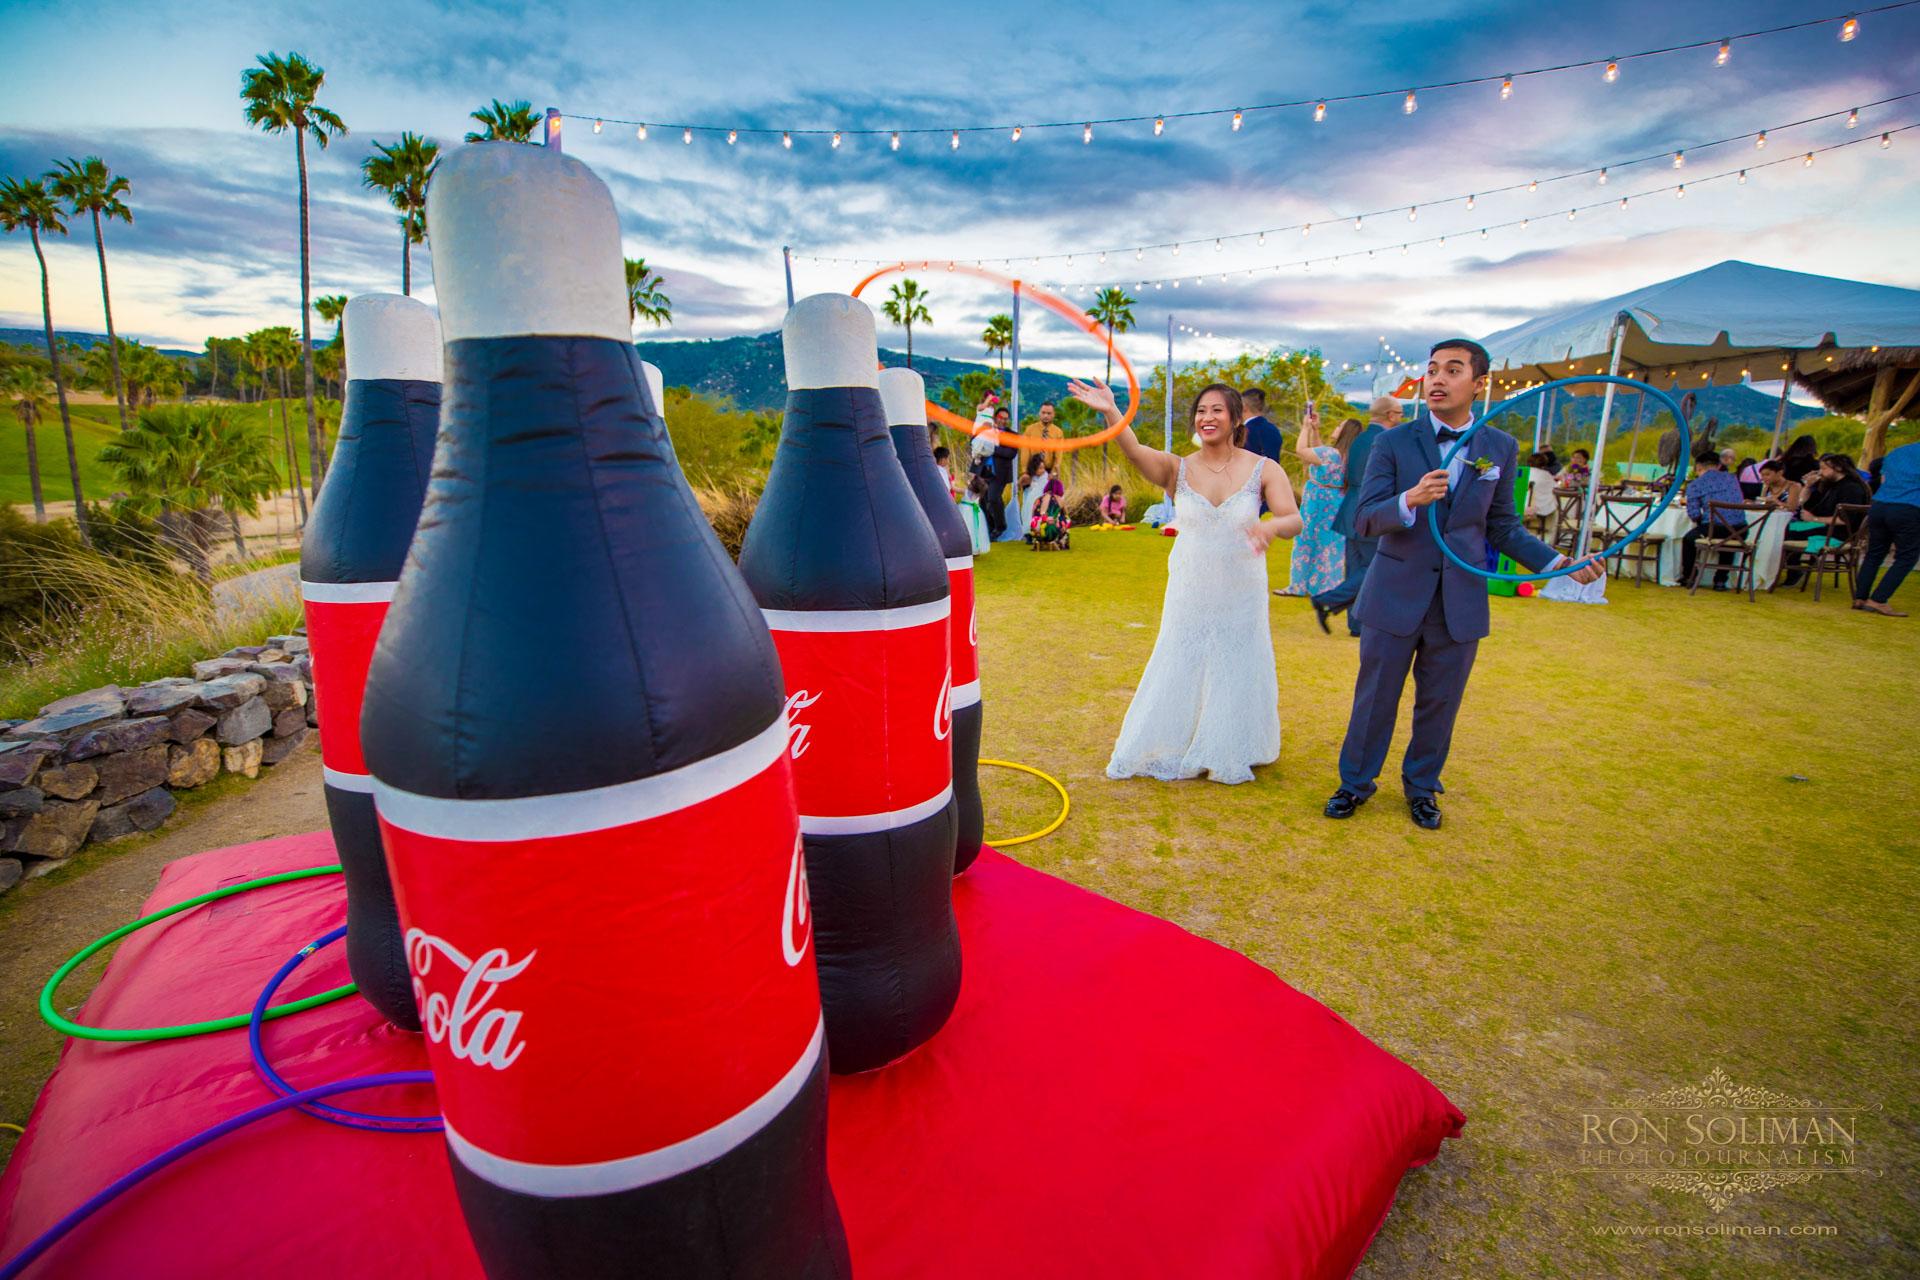 SAN DIEGO ZOO SAFARI PARK WEDDING 17